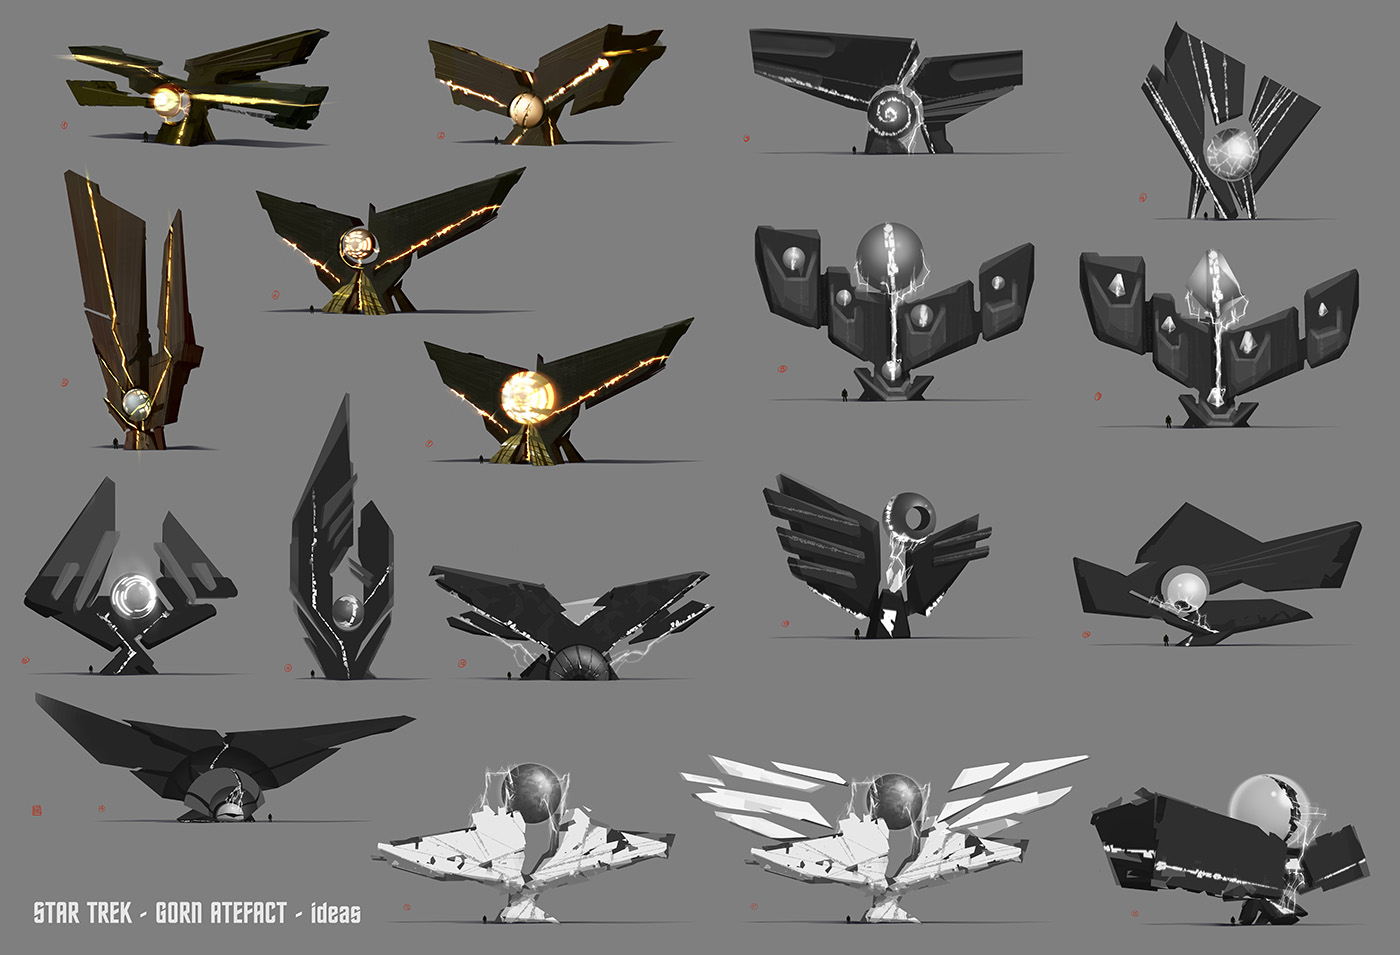 StarTrek_16_Gorn_Artefact_01